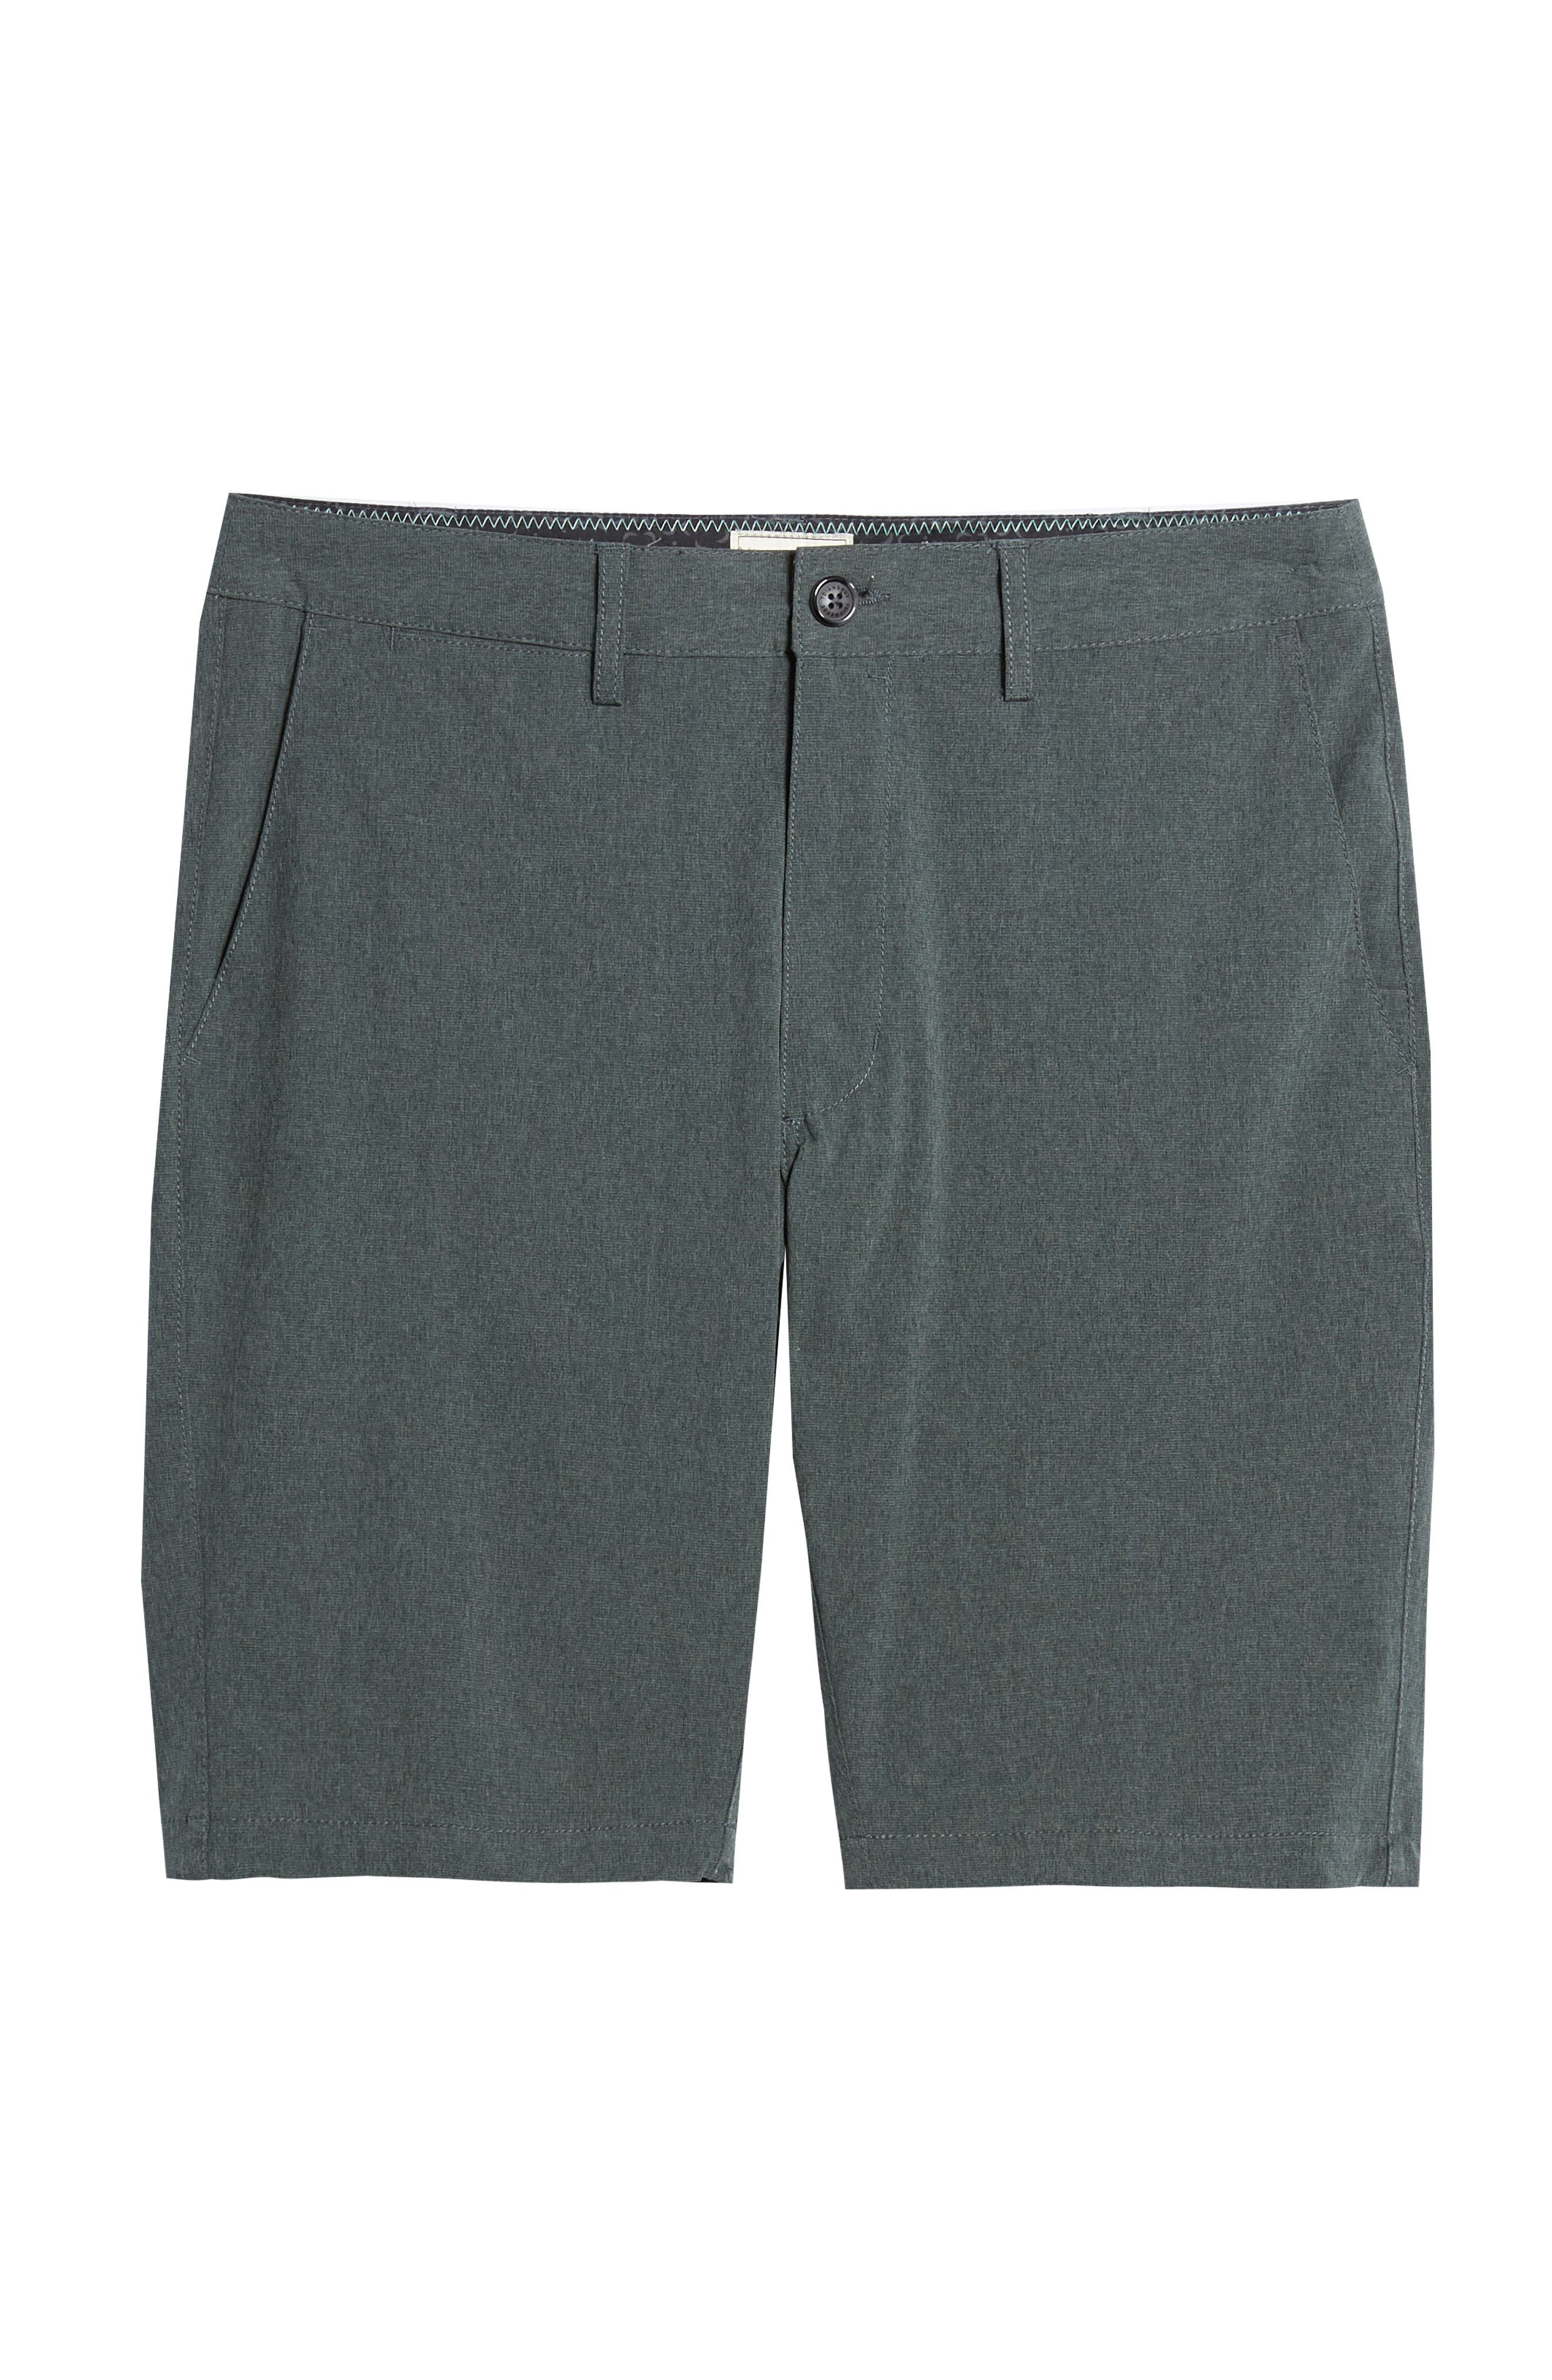 Adrenaline Stretch Shorts,                             Alternate thumbnail 6, color,                             010